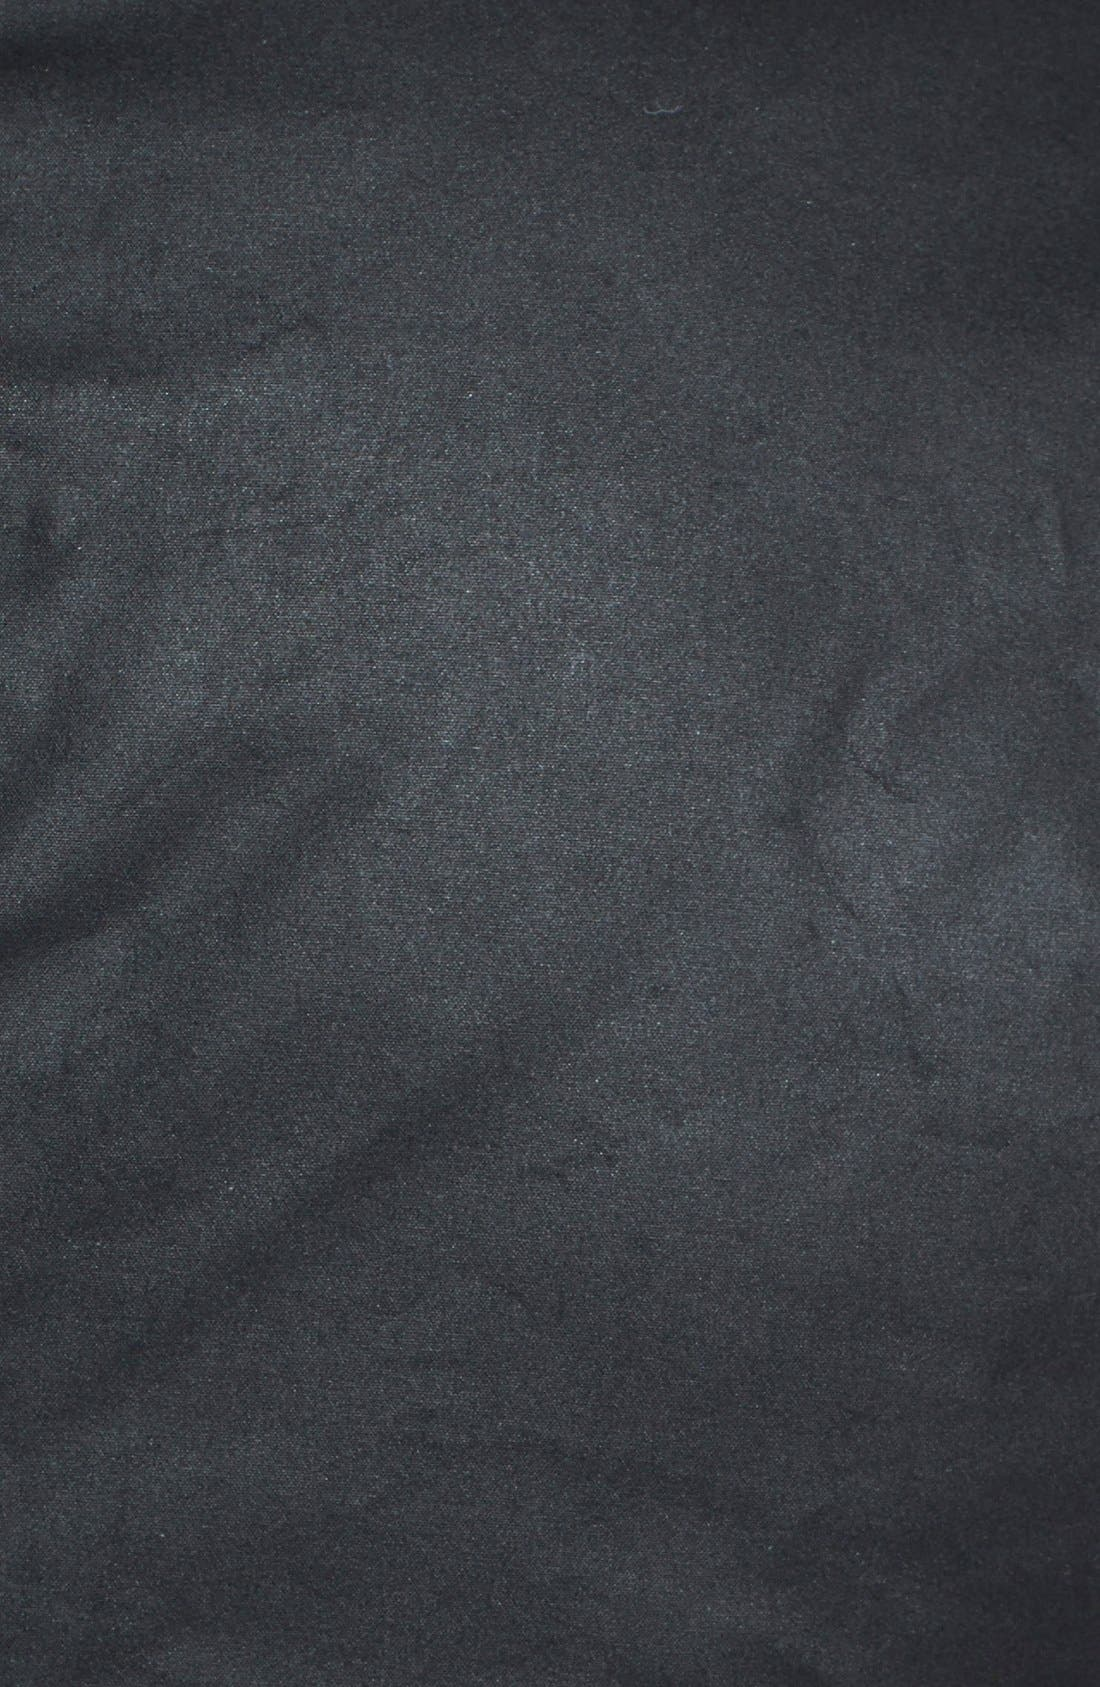 Alternate Image 3  - Barbour 'Duke' Regular Fit Waterproof Waxed Cotton Jacket